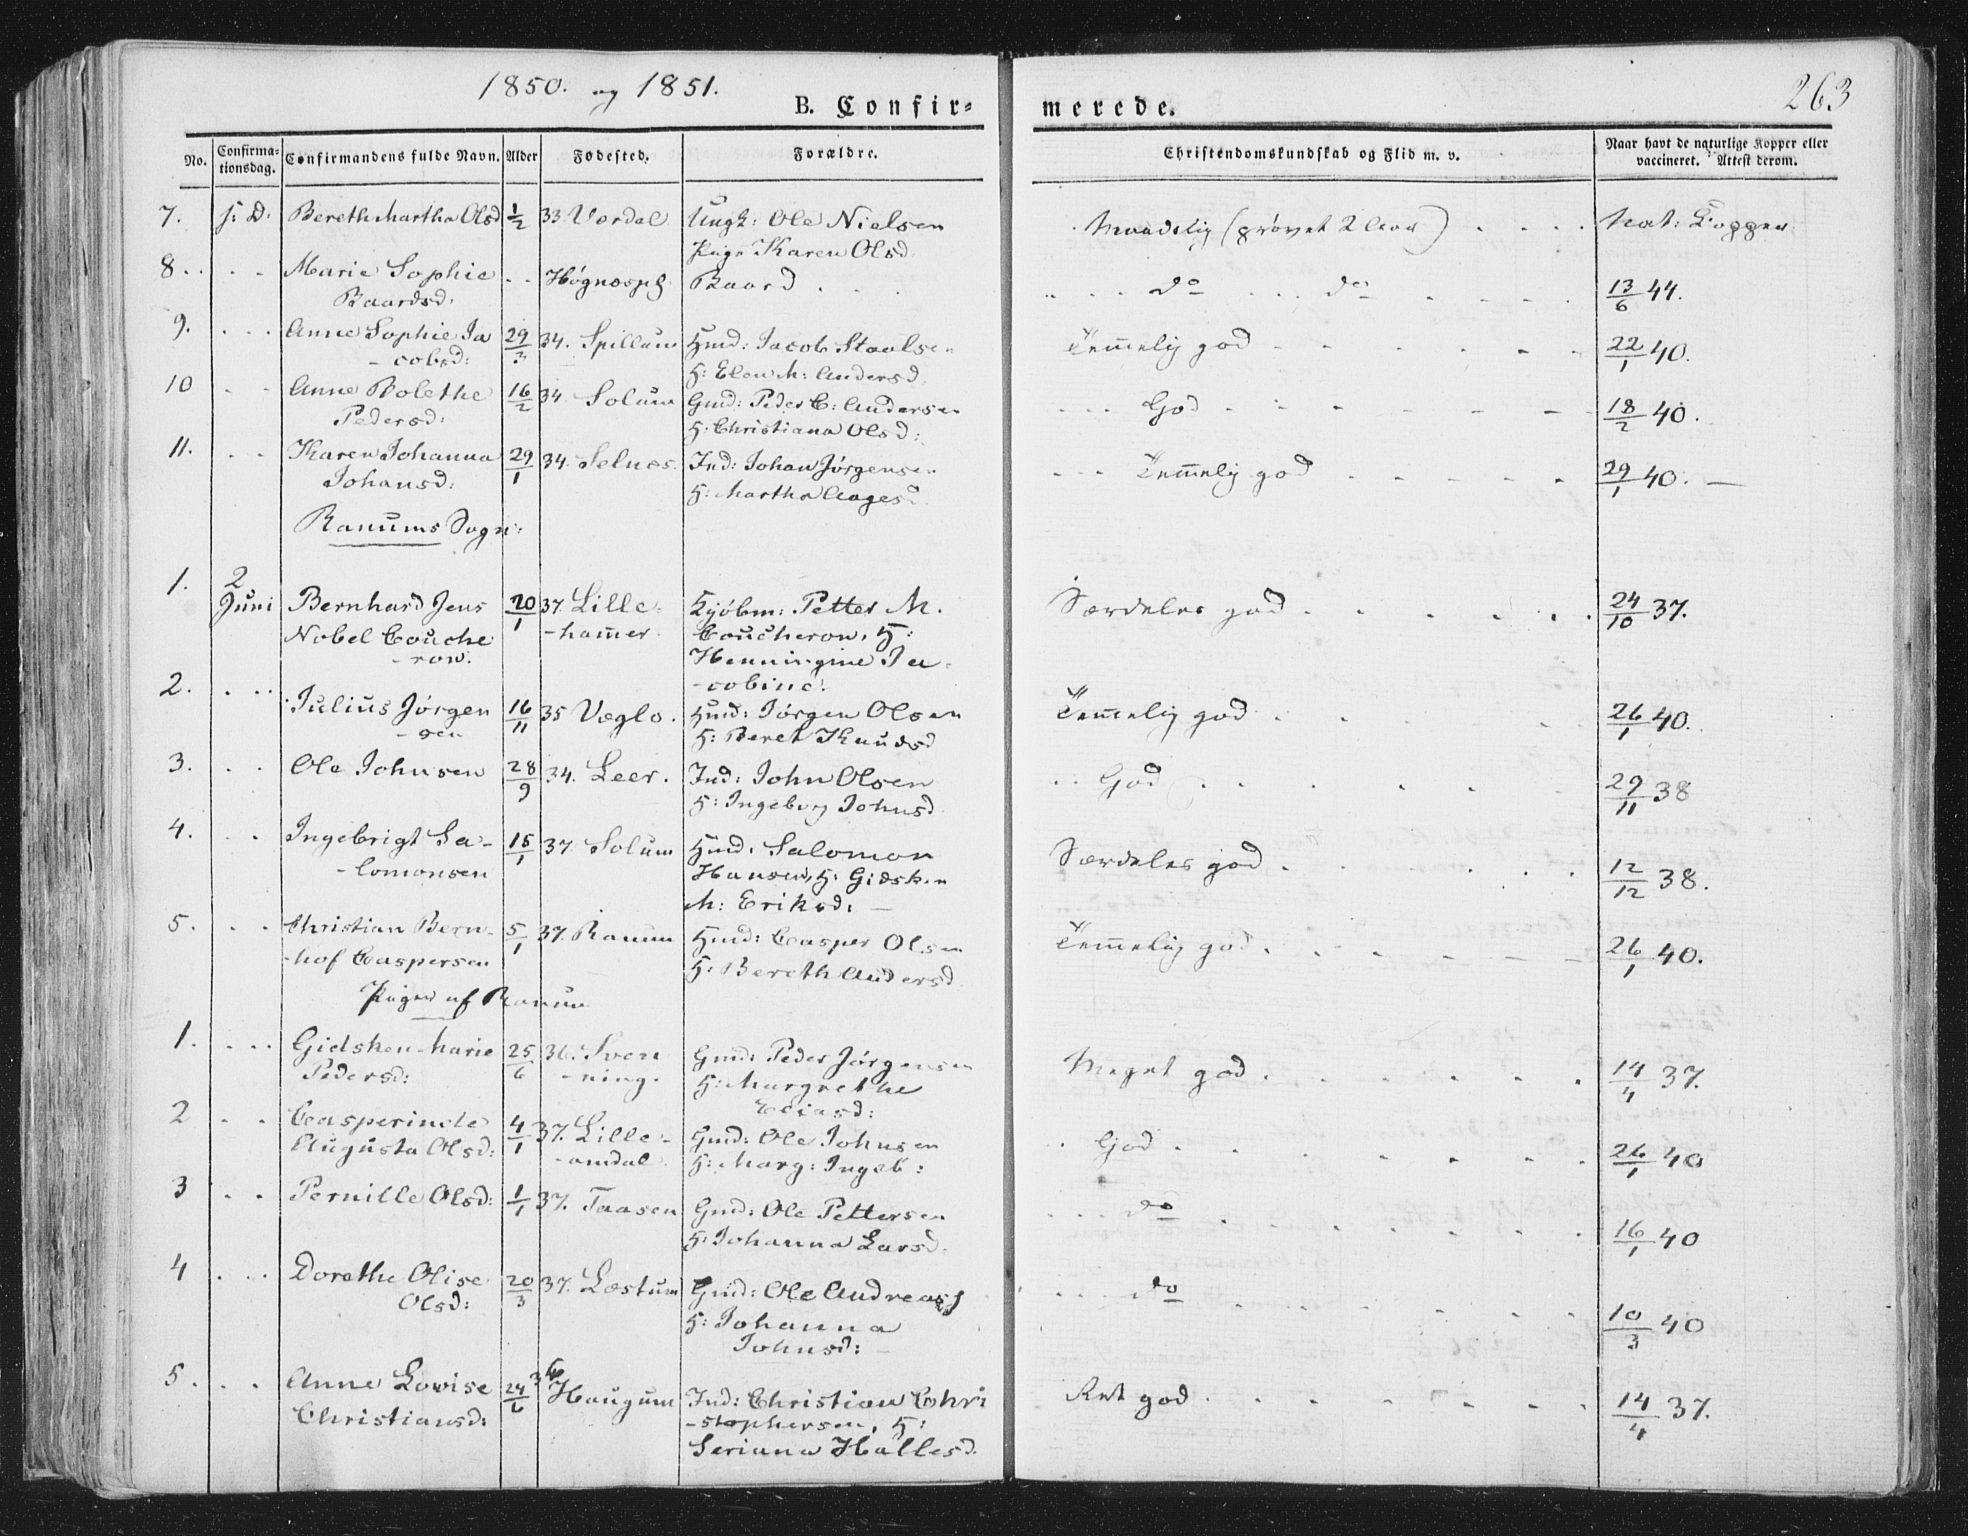 SAT, Ministerialprotokoller, klokkerbøker og fødselsregistre - Nord-Trøndelag, 764/L0551: Ministerialbok nr. 764A07a, 1824-1864, s. 263